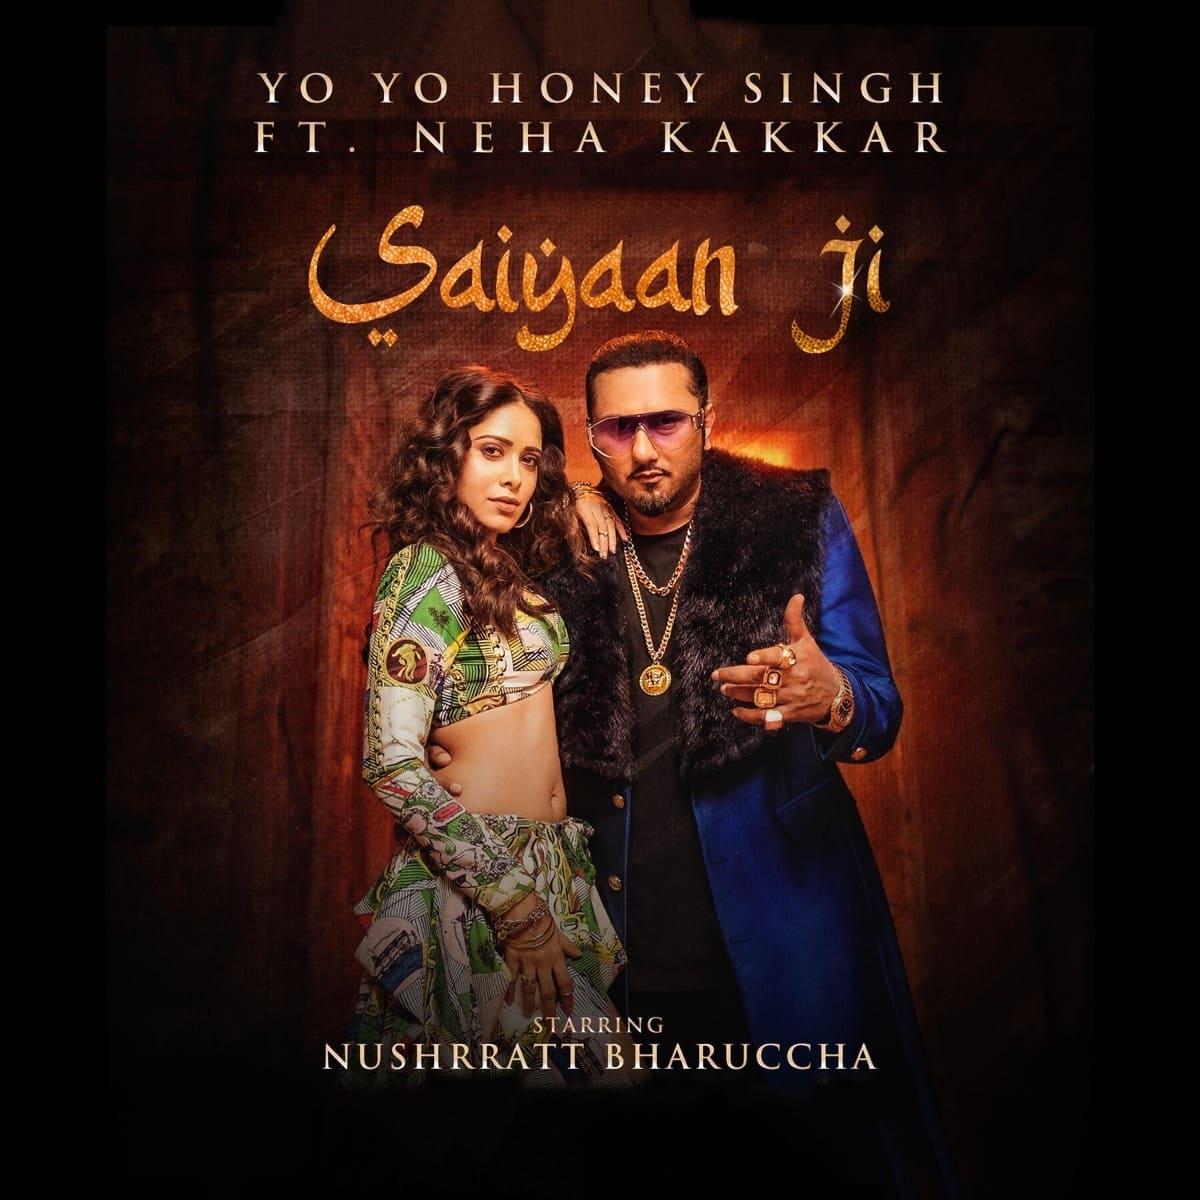 Saiyaan Ji Honey Singh Song Image